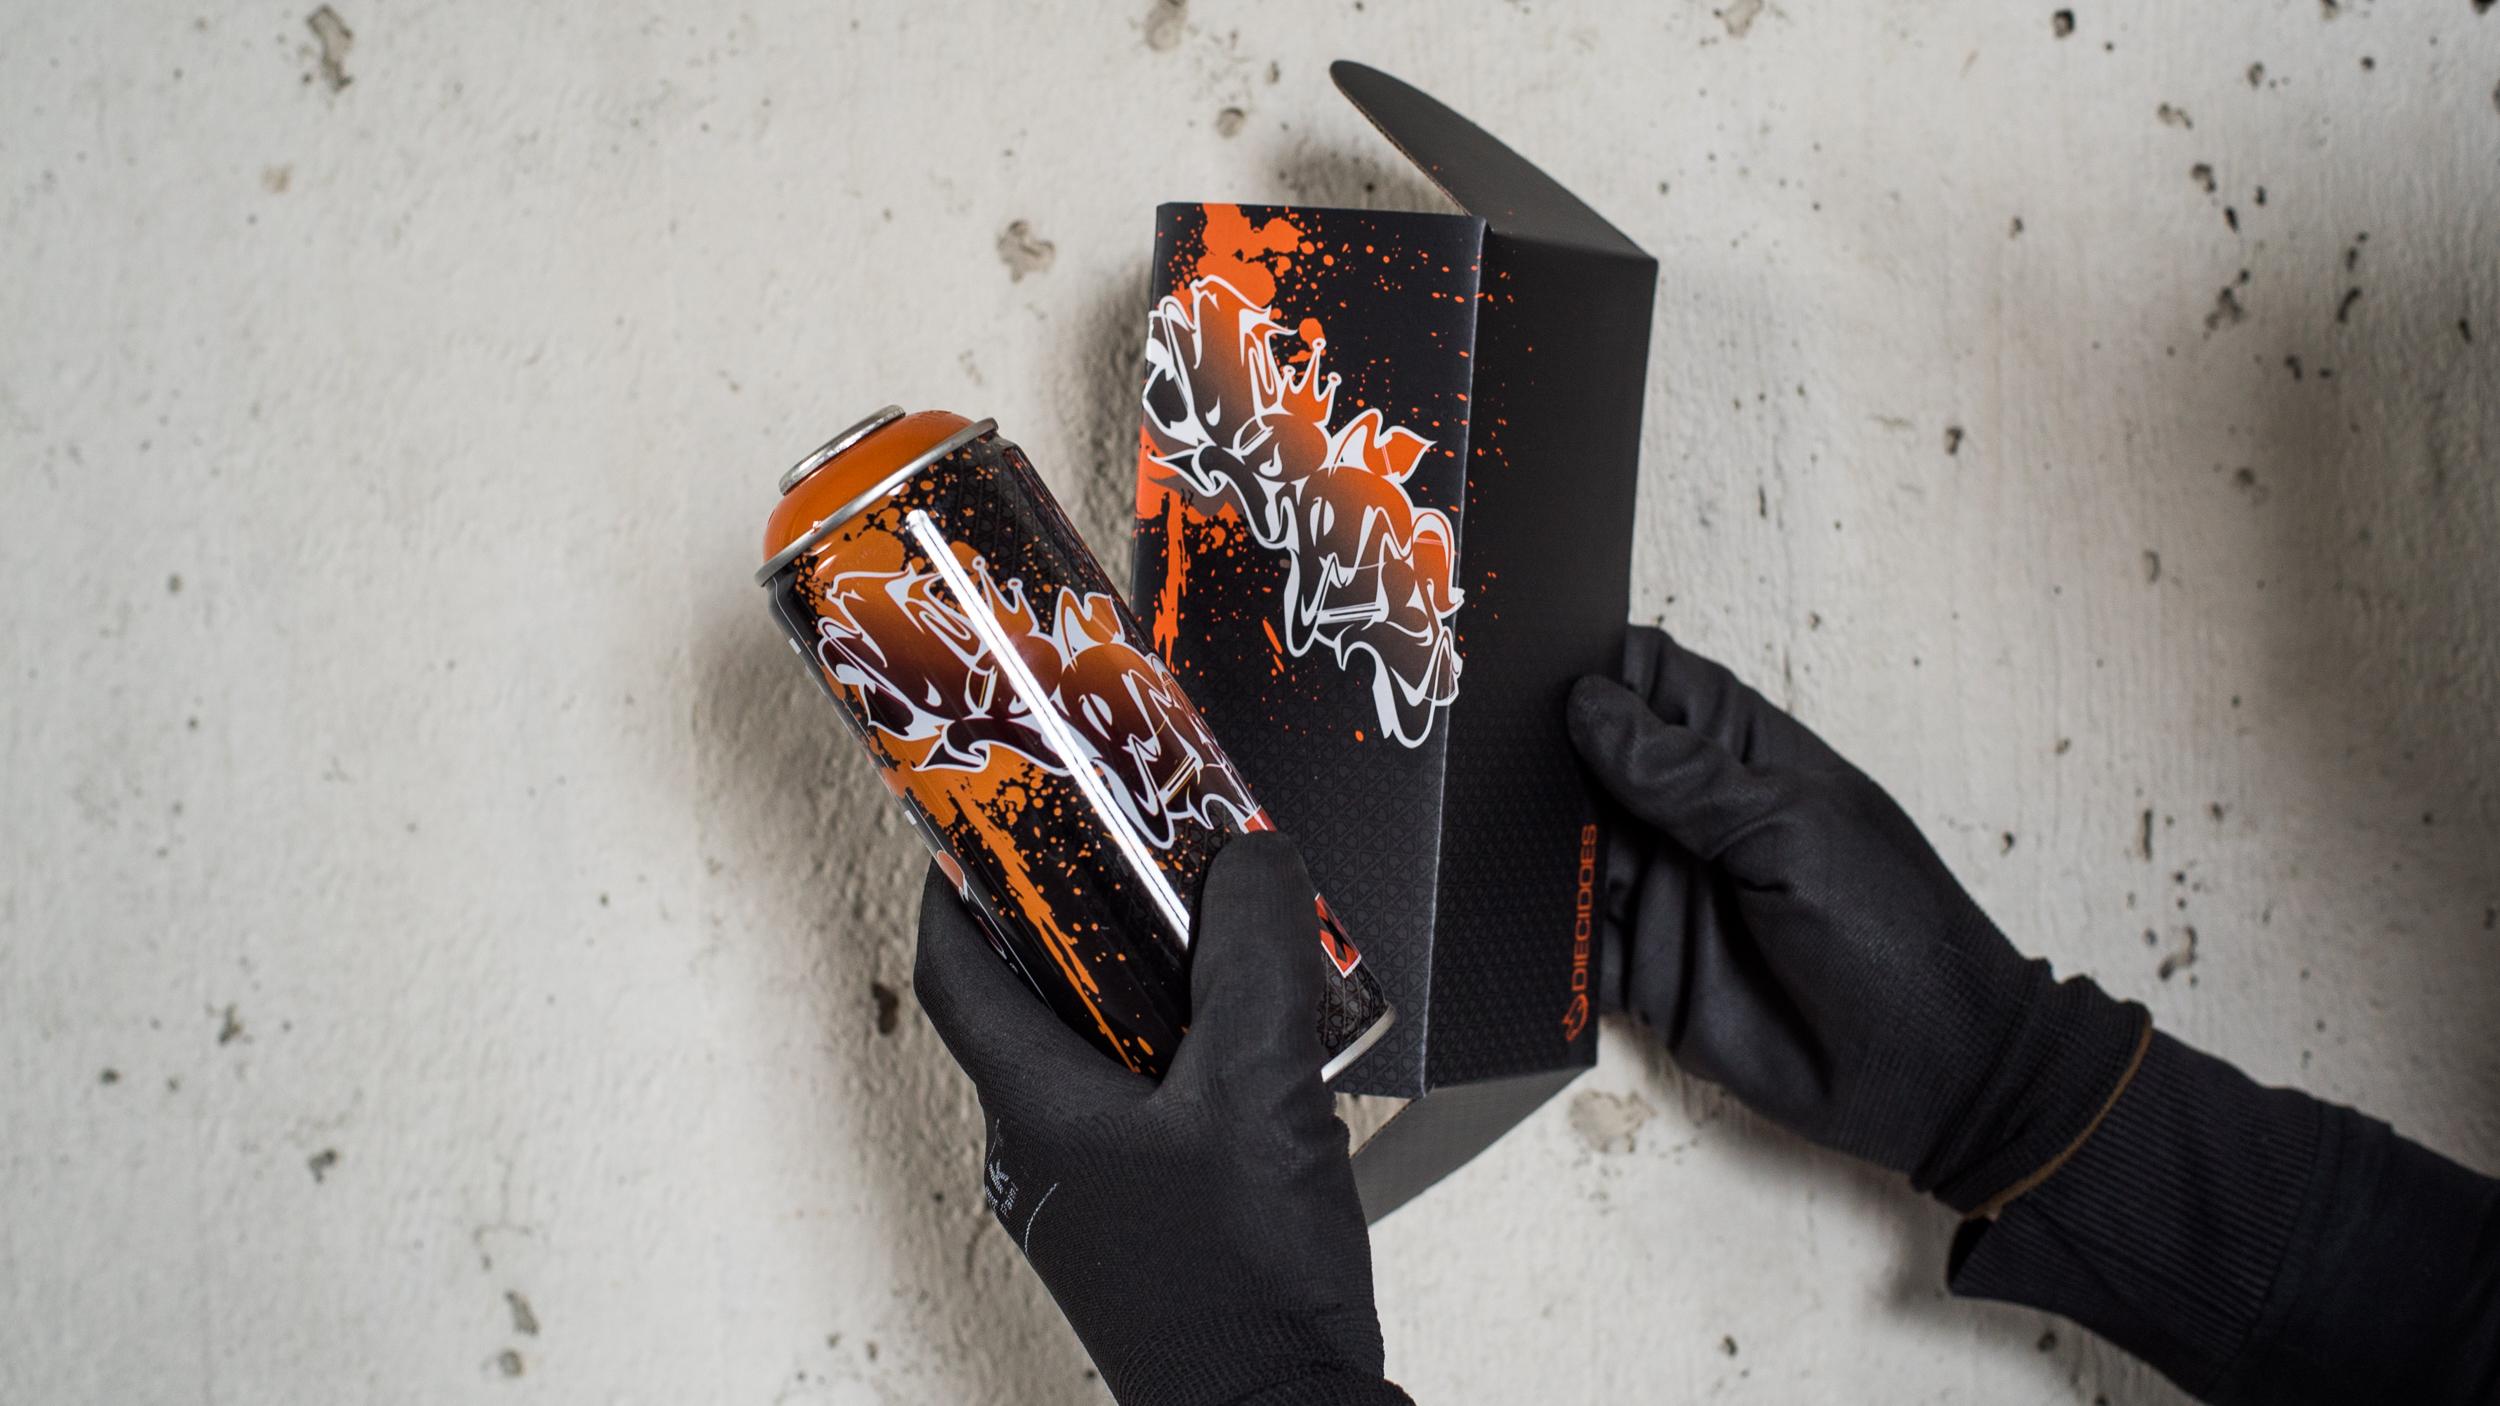 A work by Does - Spraycan dieci does box 3